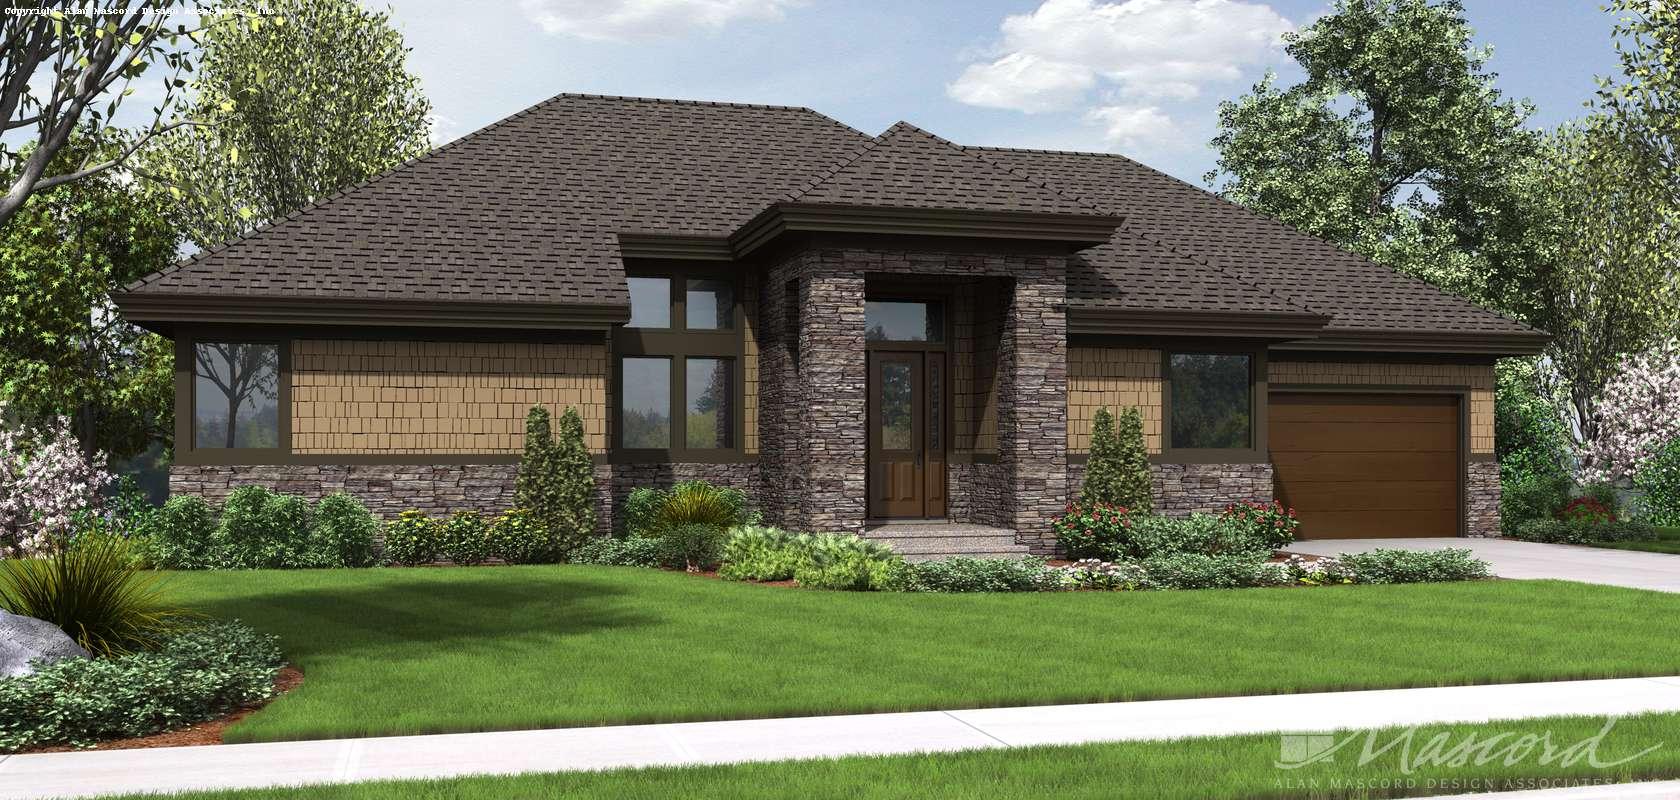 Mascord House Plan 1332: The Thompson